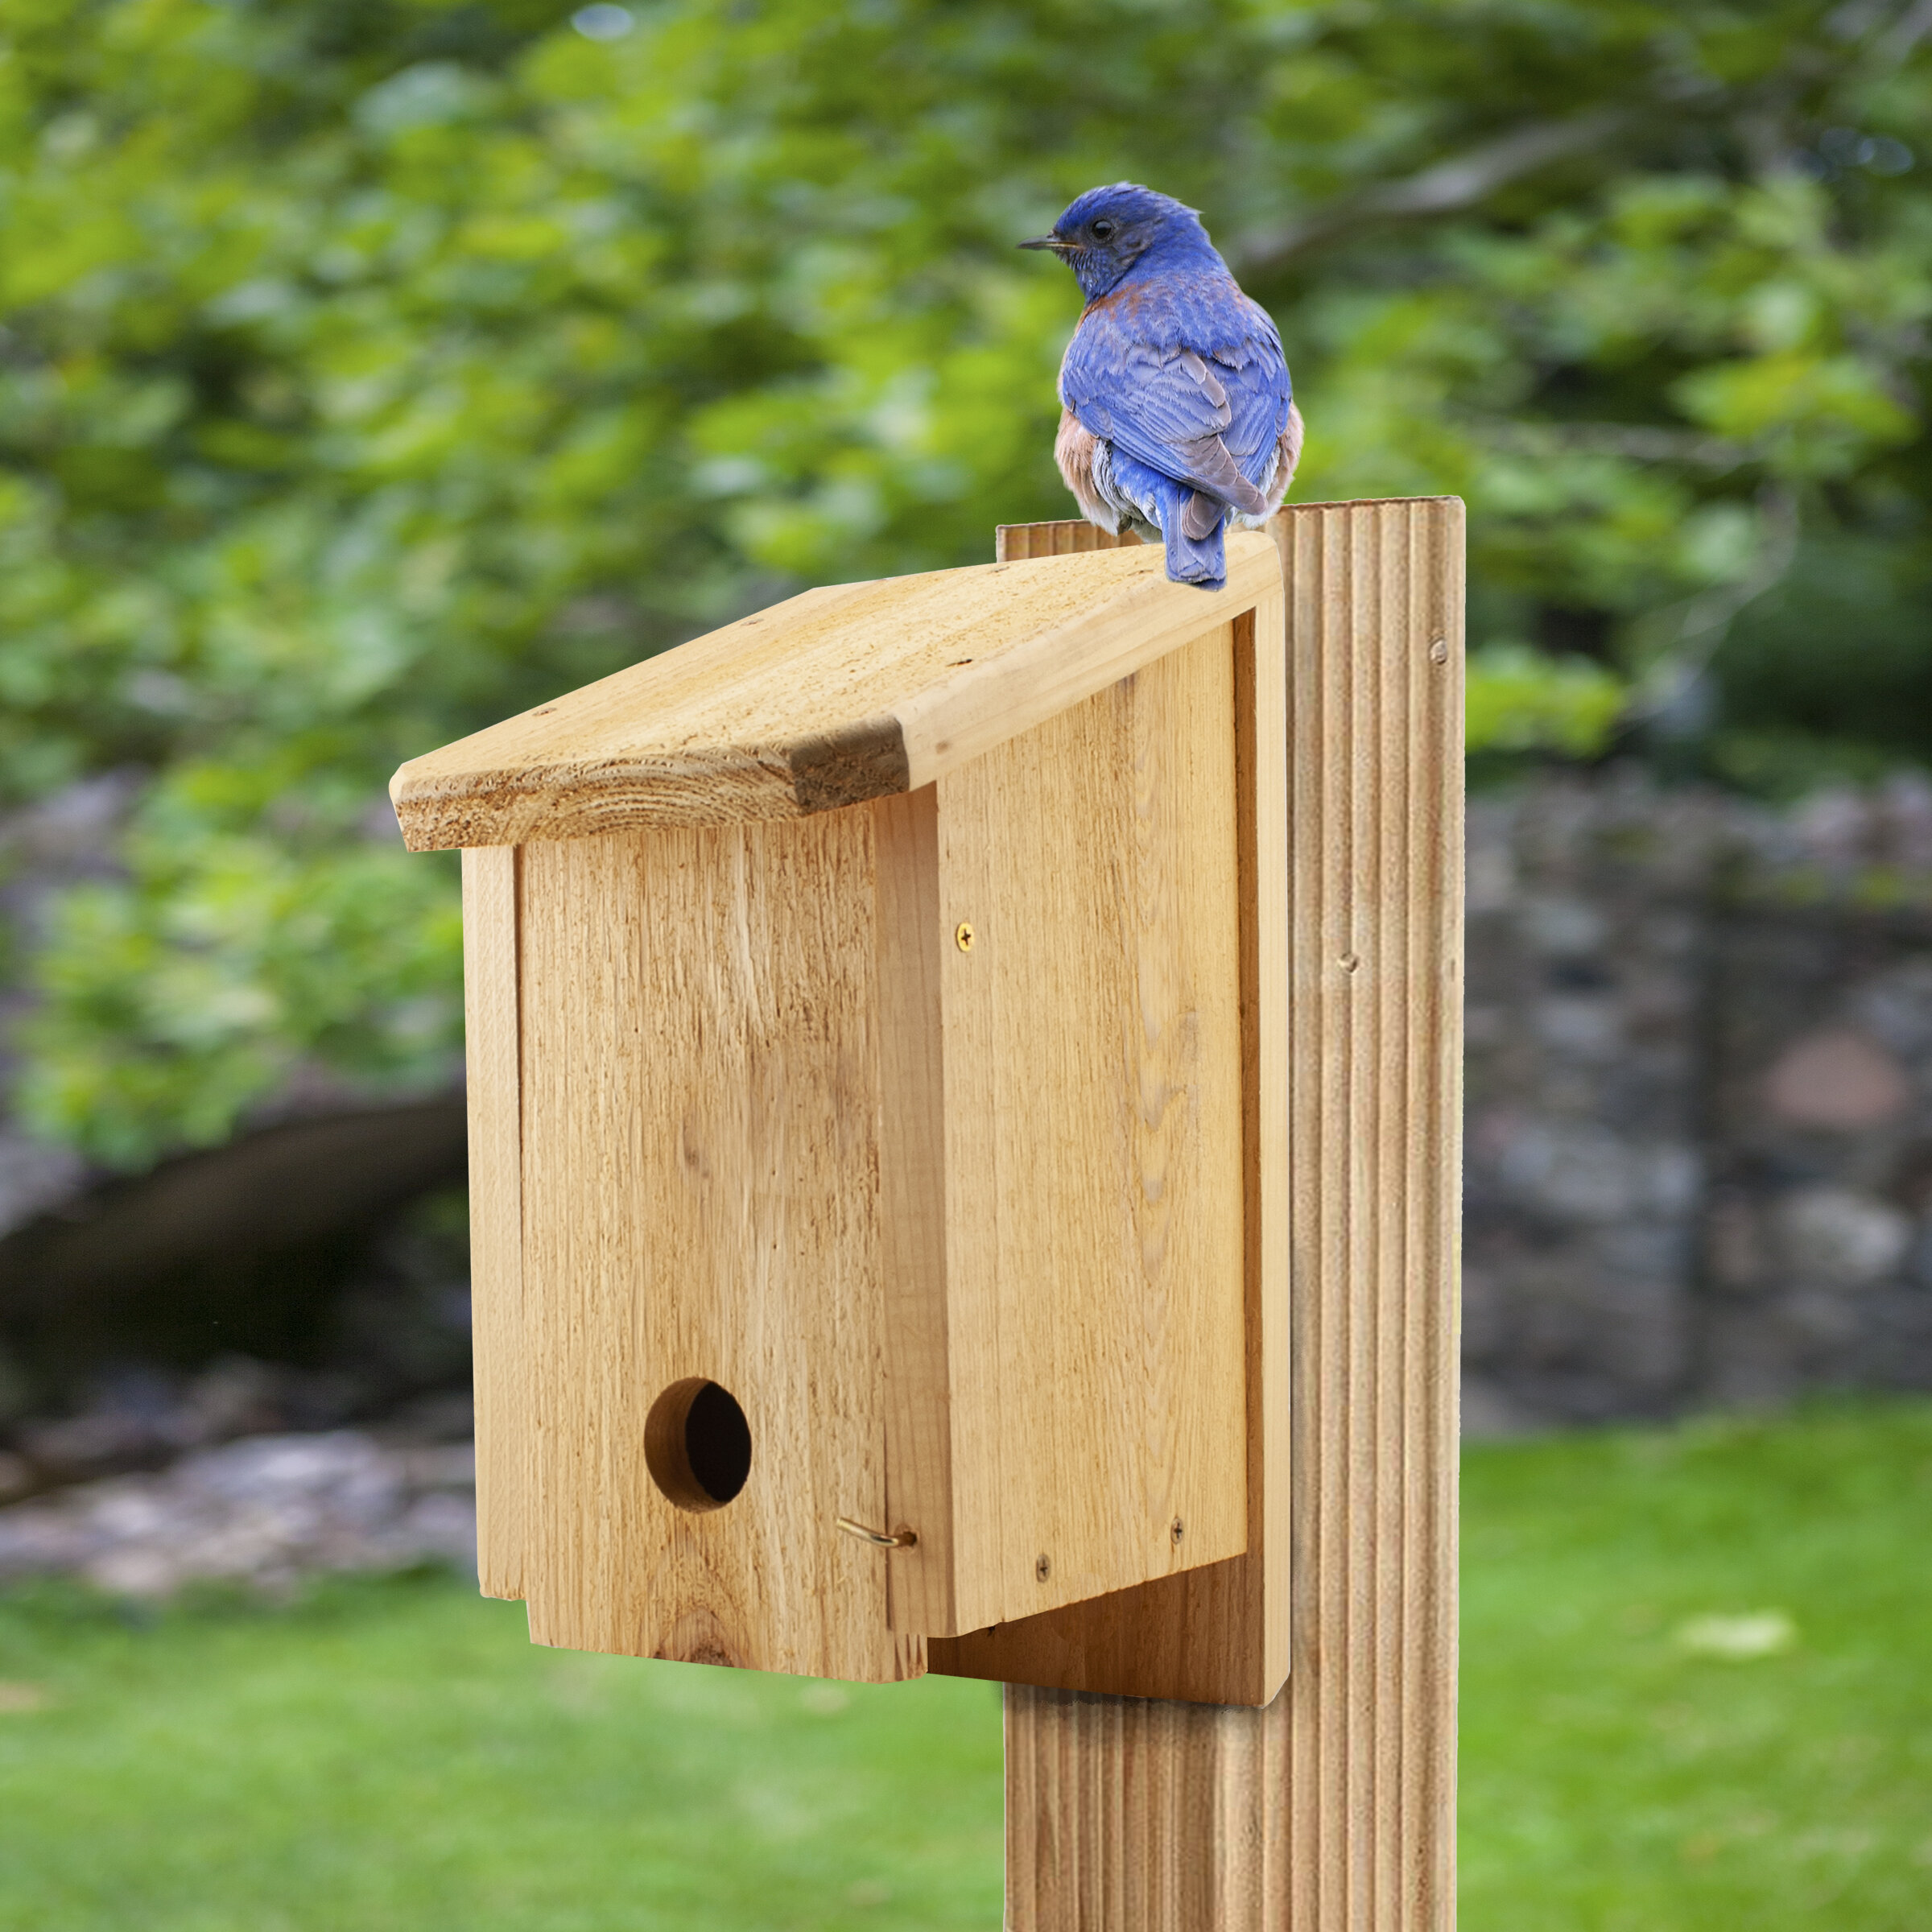 Woodlink Winter Roosting 15 In X 10 In X 6 In Birdhouse Wayfair